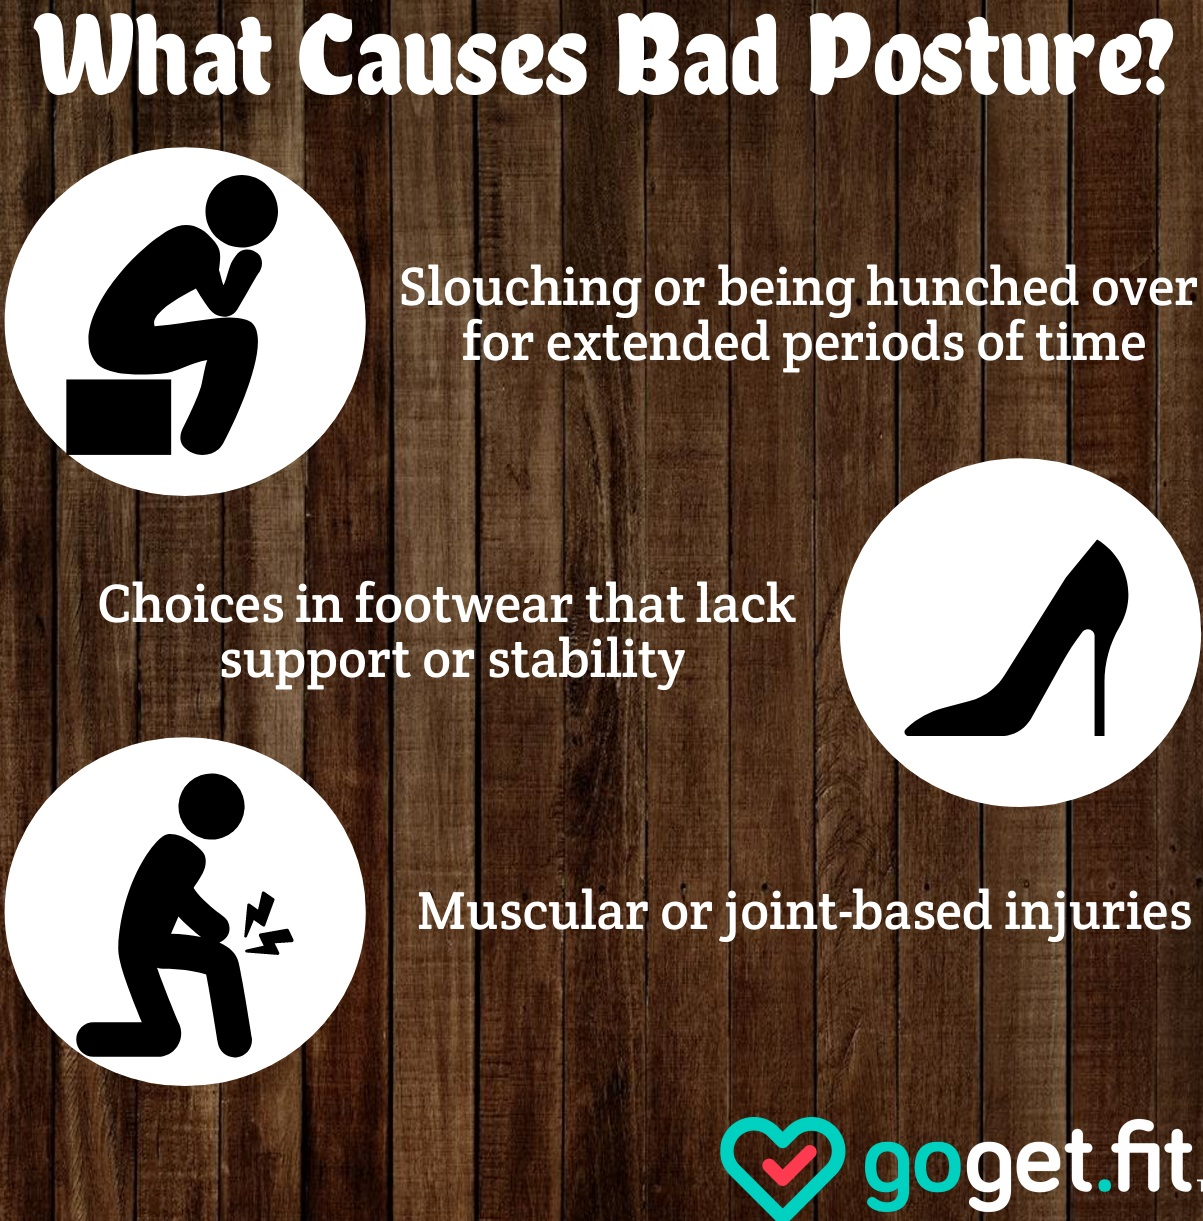 What+Causes+Bad+Posture.jpg